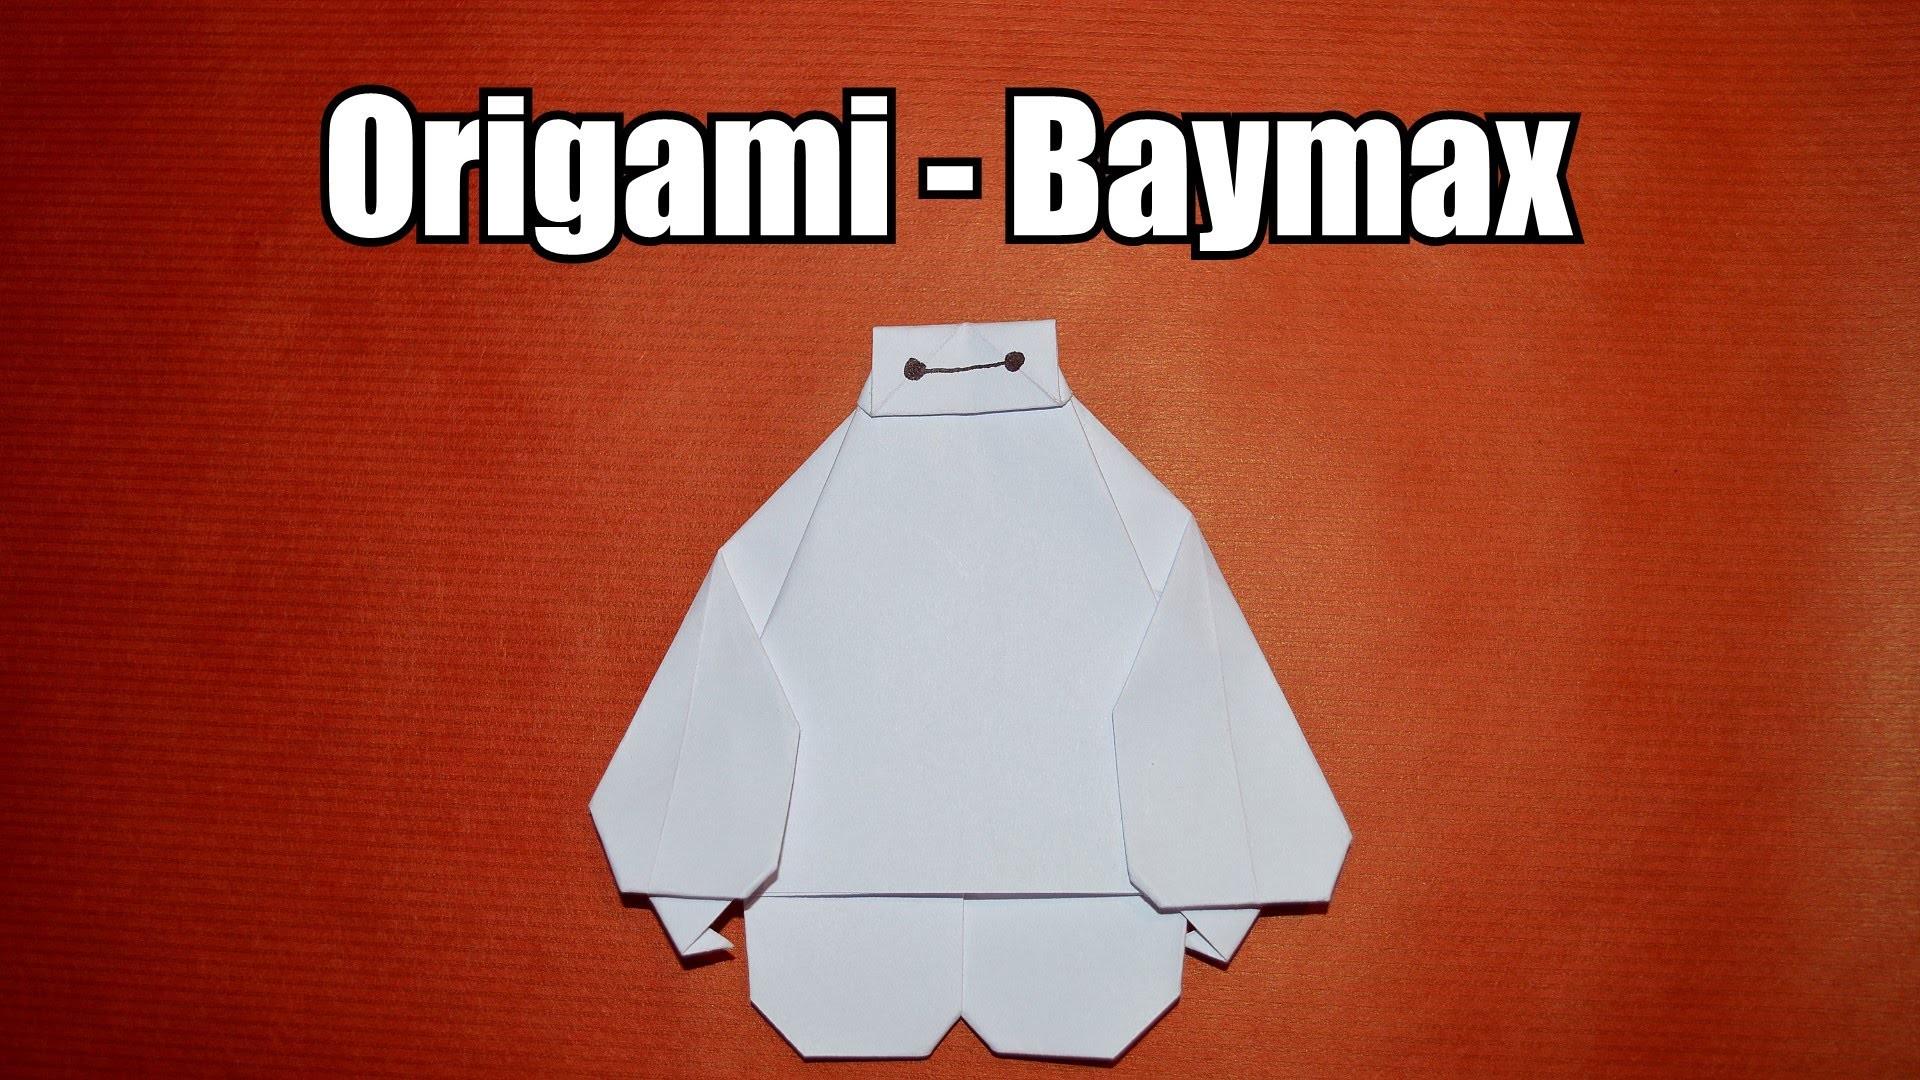 Origami - Baymax